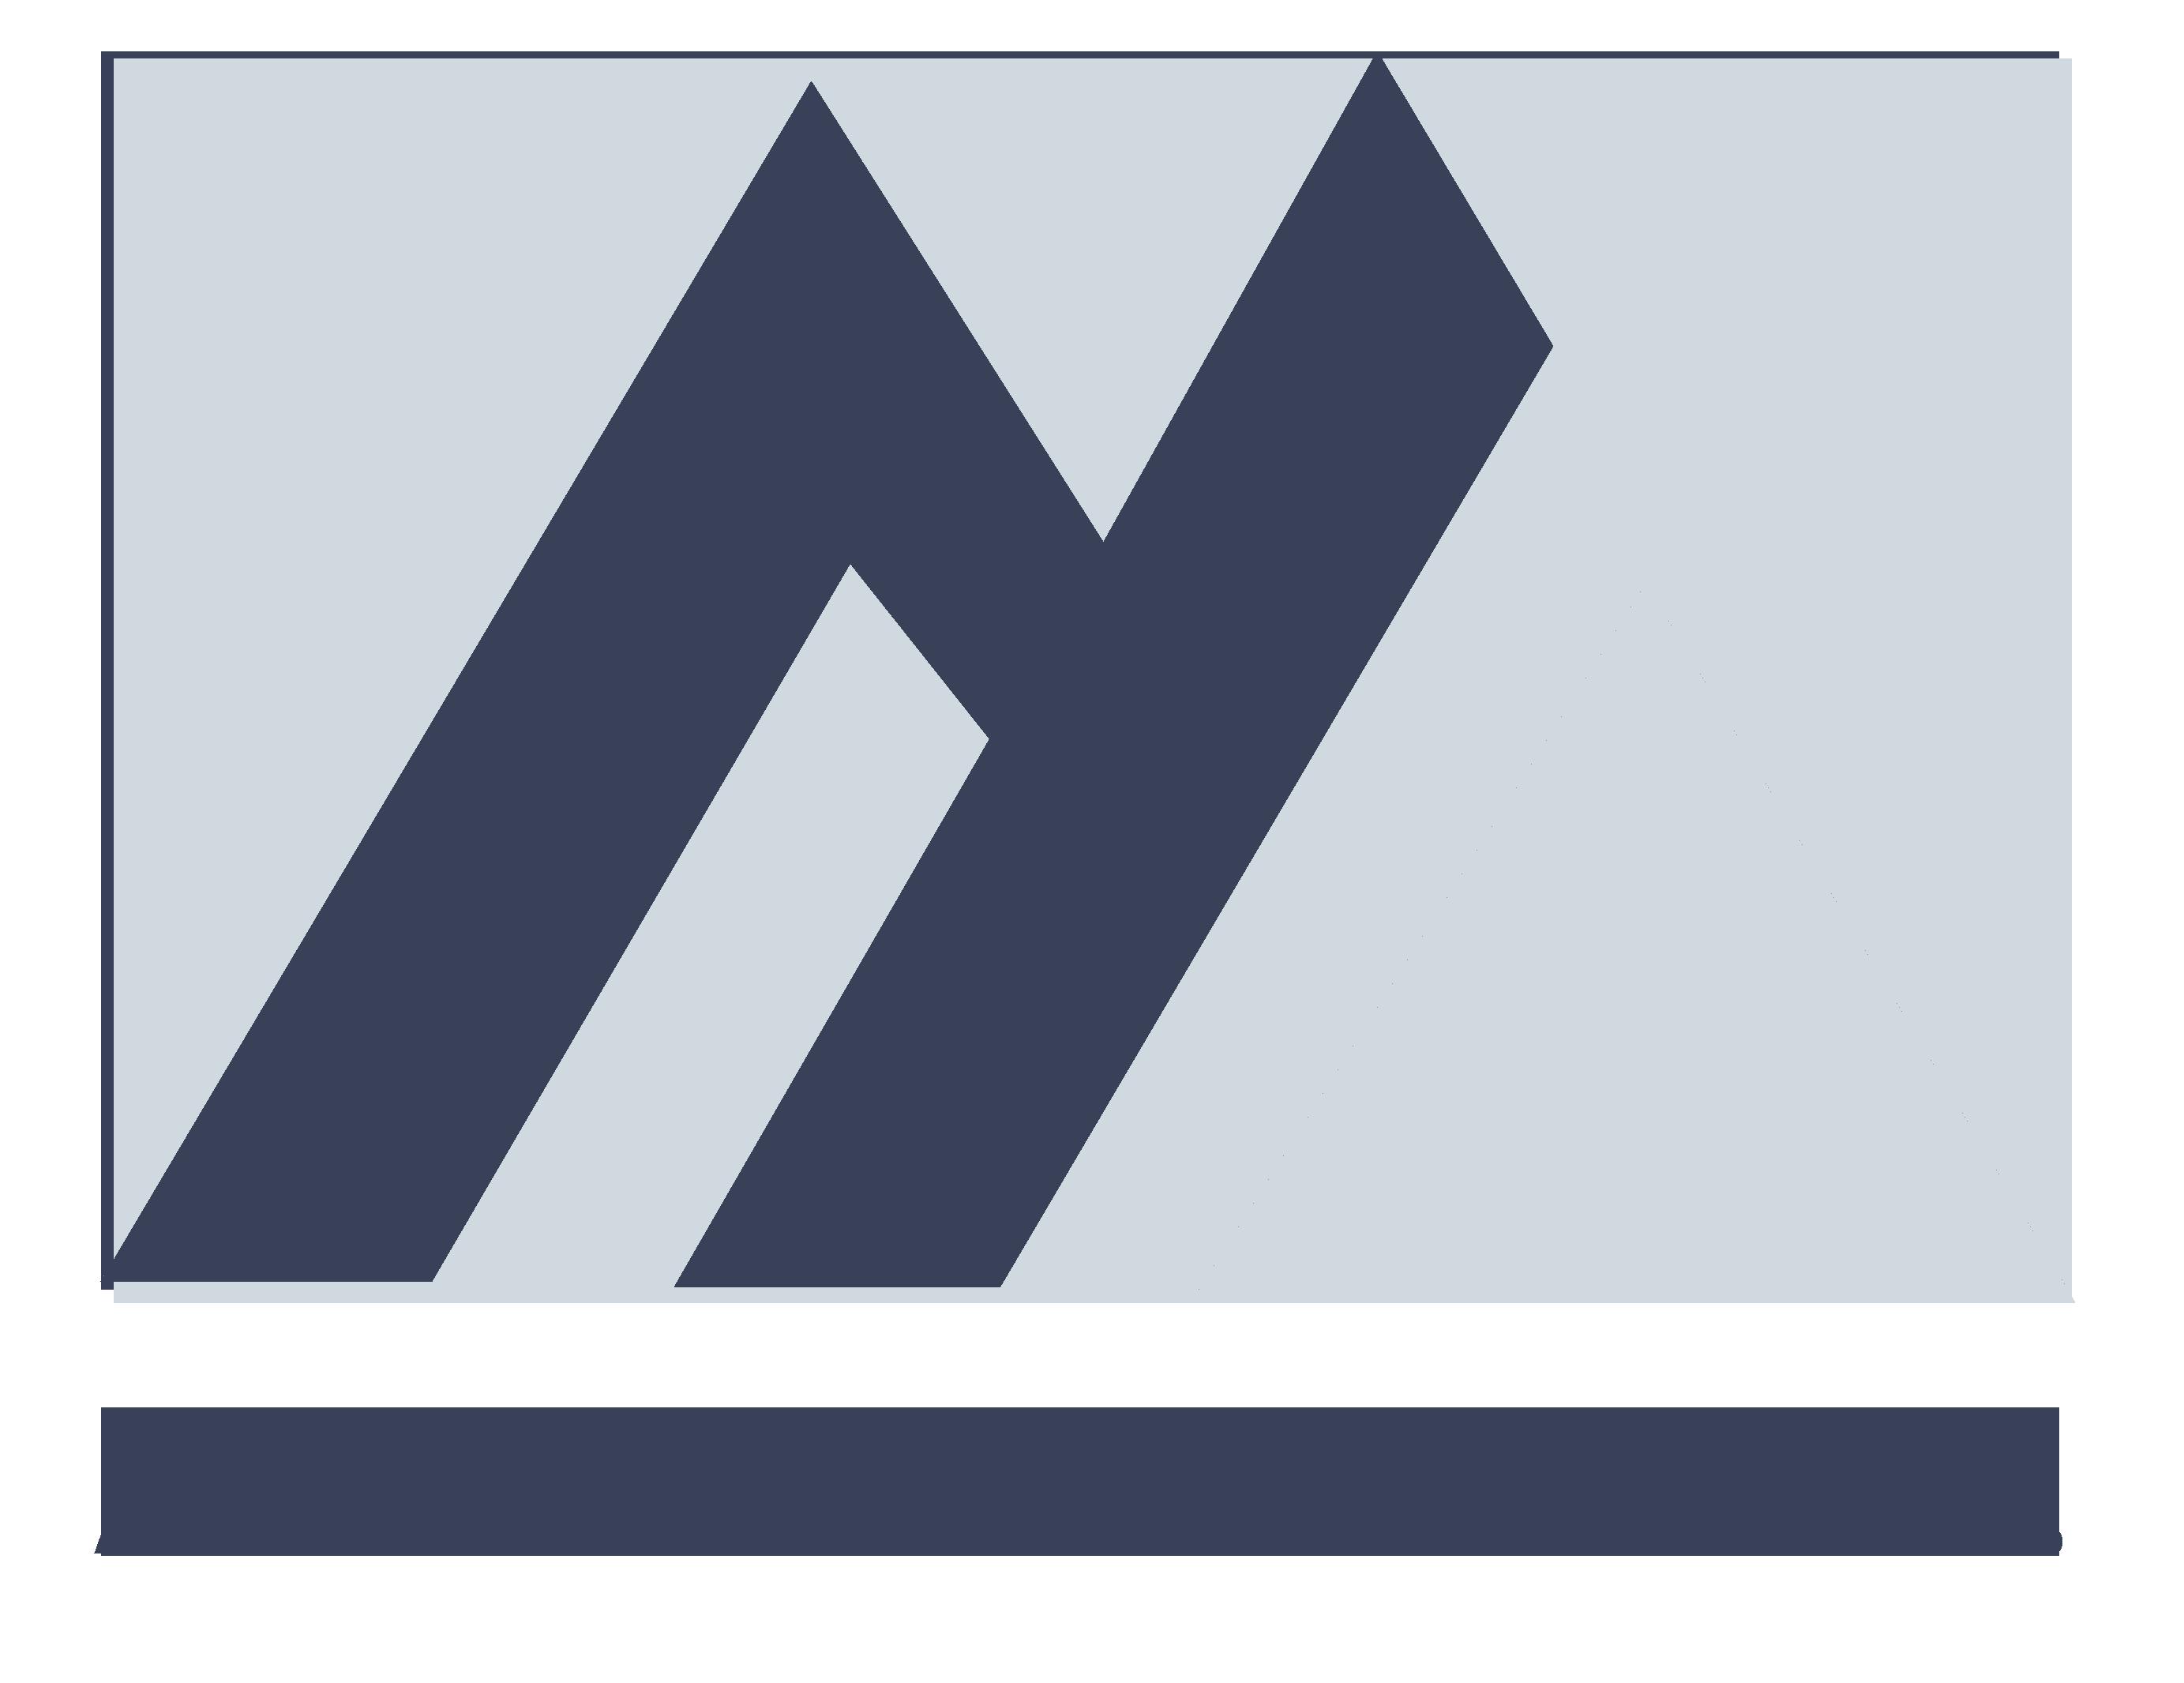 Almaden Confirms 100% Ownership of Ixtaca Project